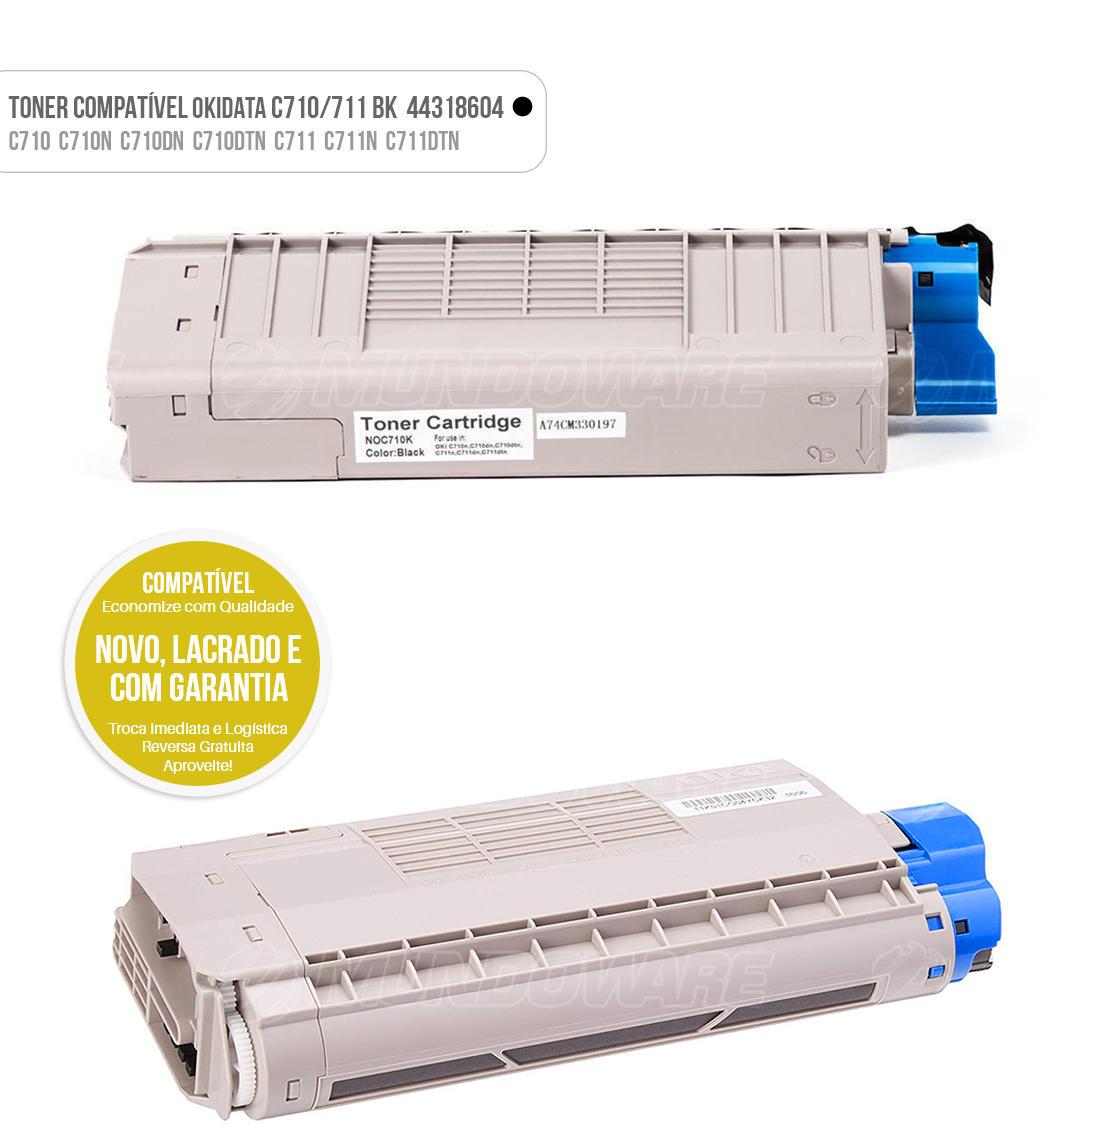 Toner Preto Compatível para impressora Okidata C710 C710N C710DN C710DTN C711 C711N C711DTN Tonner